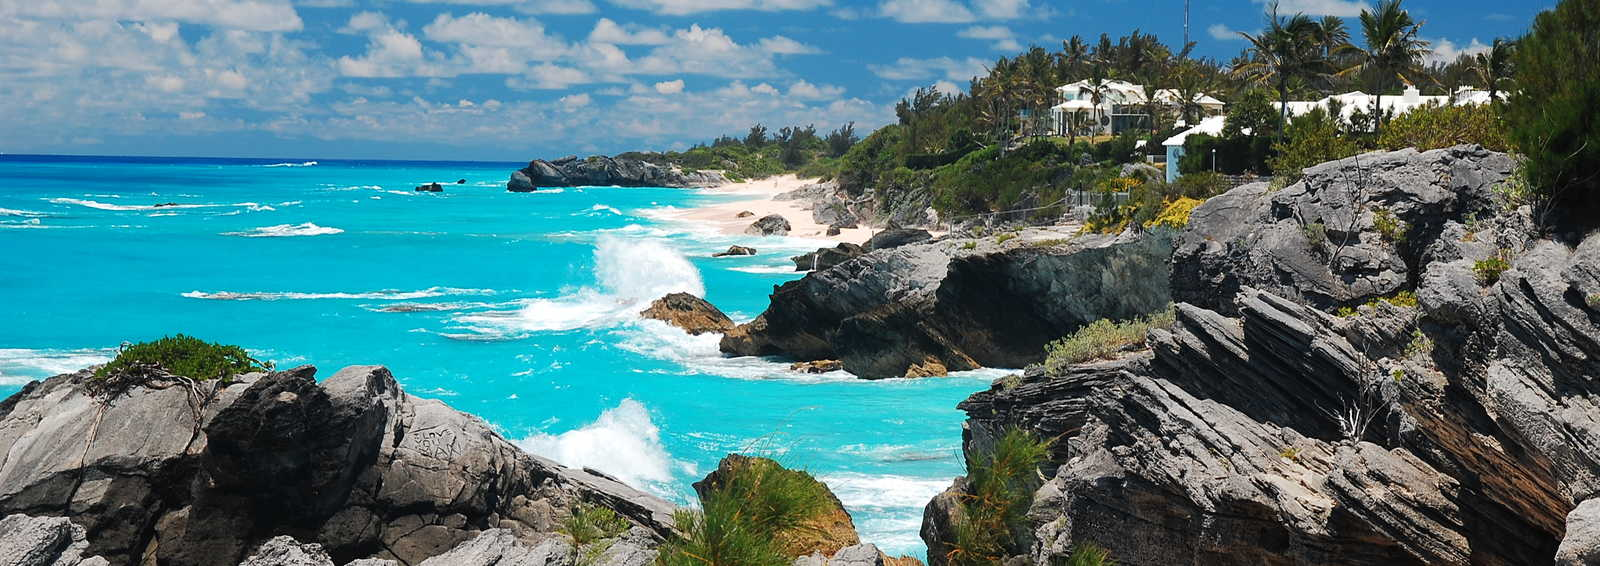 Where are Bermuda Holidays in Bermuda 76